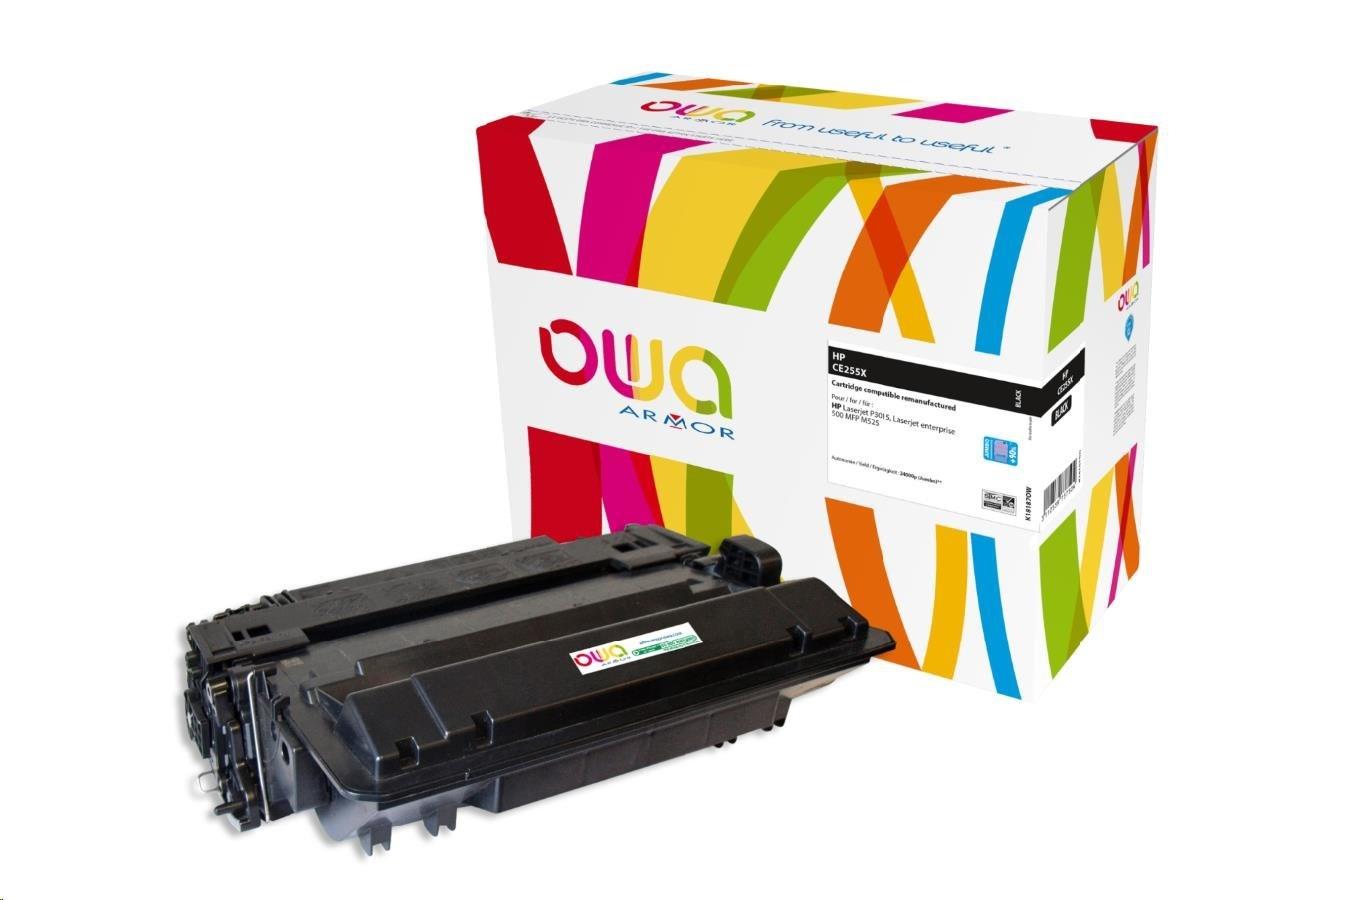 OWA Armor toner pro HP Laserjet P3015 JUMBO, 24000 stran, CE255X, černá/black